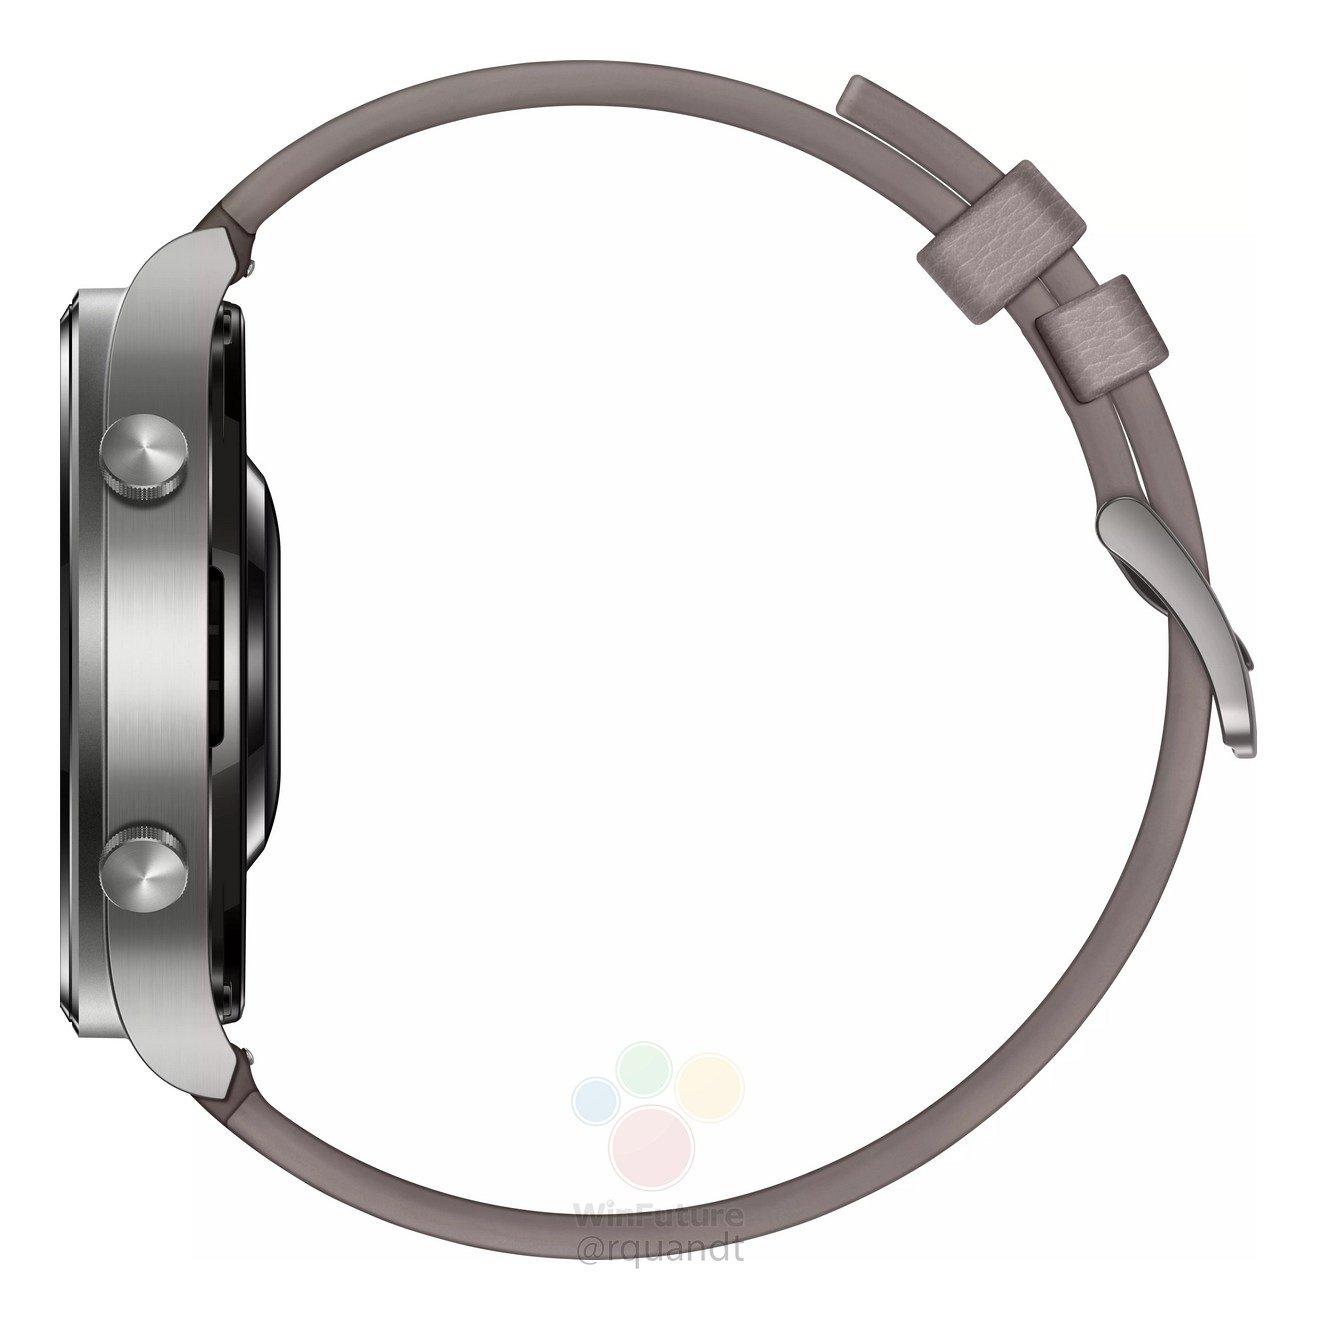 Huawei Watch GT2 Pro 1599138640 0 0 large